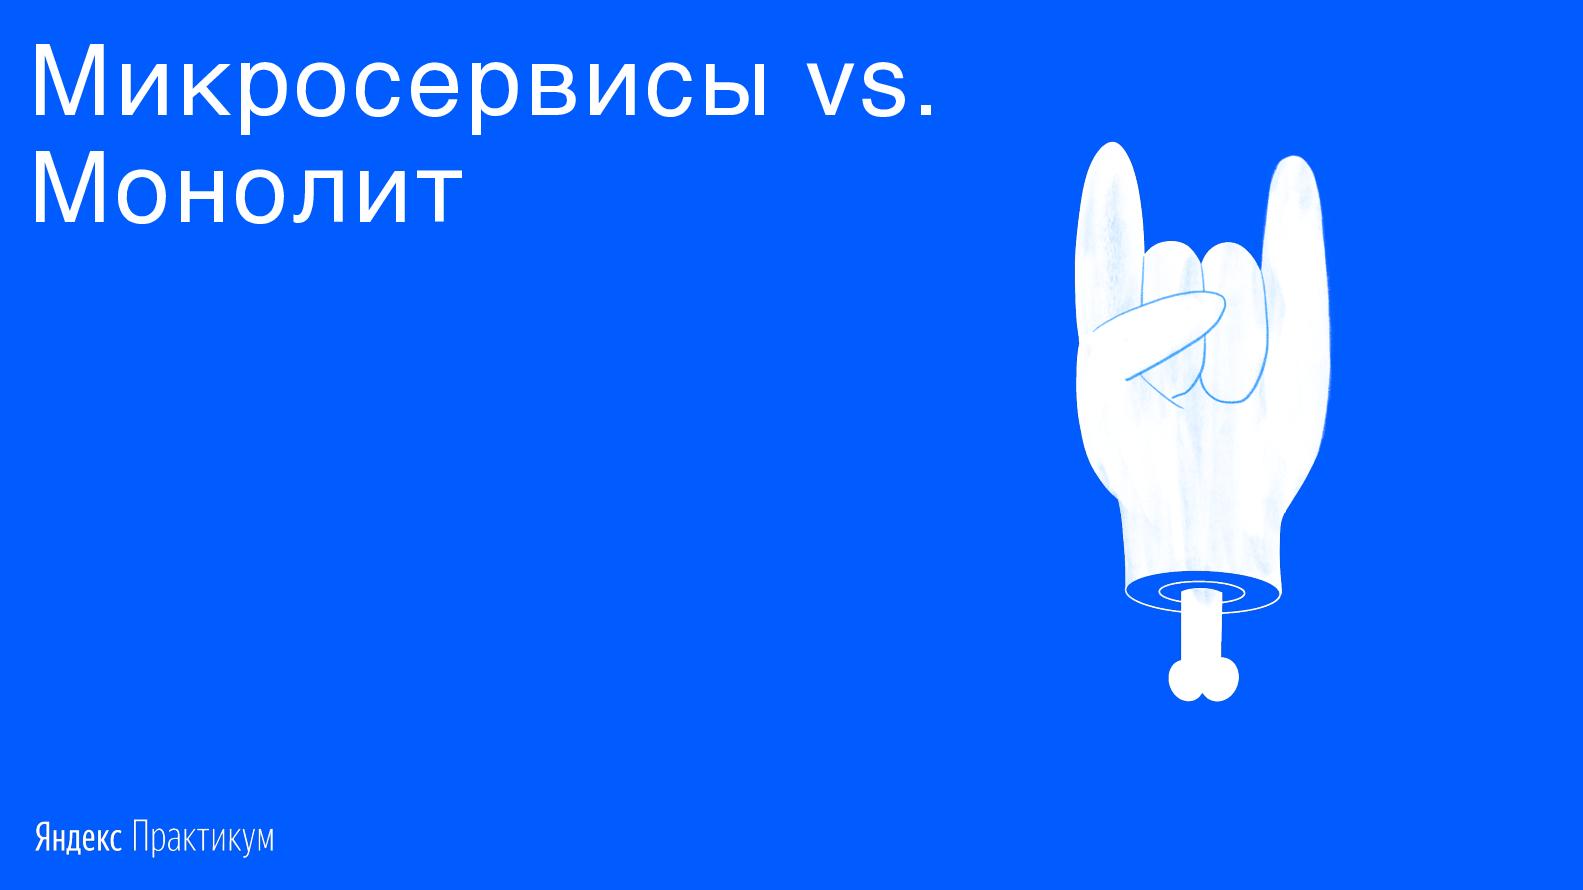 Микросервисы vs. Монолит